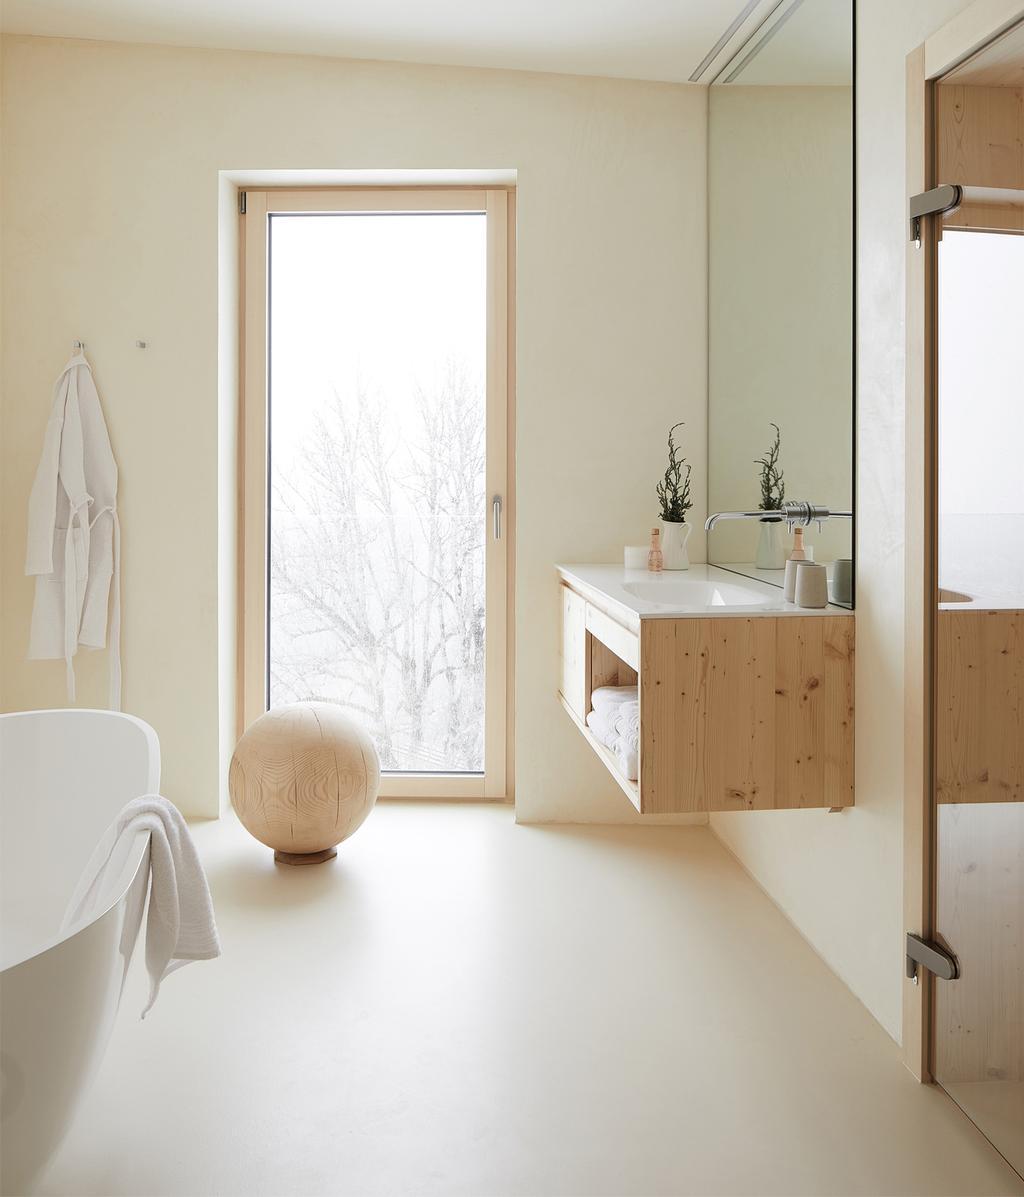 Serene badkamer | vtwonen 13-2020